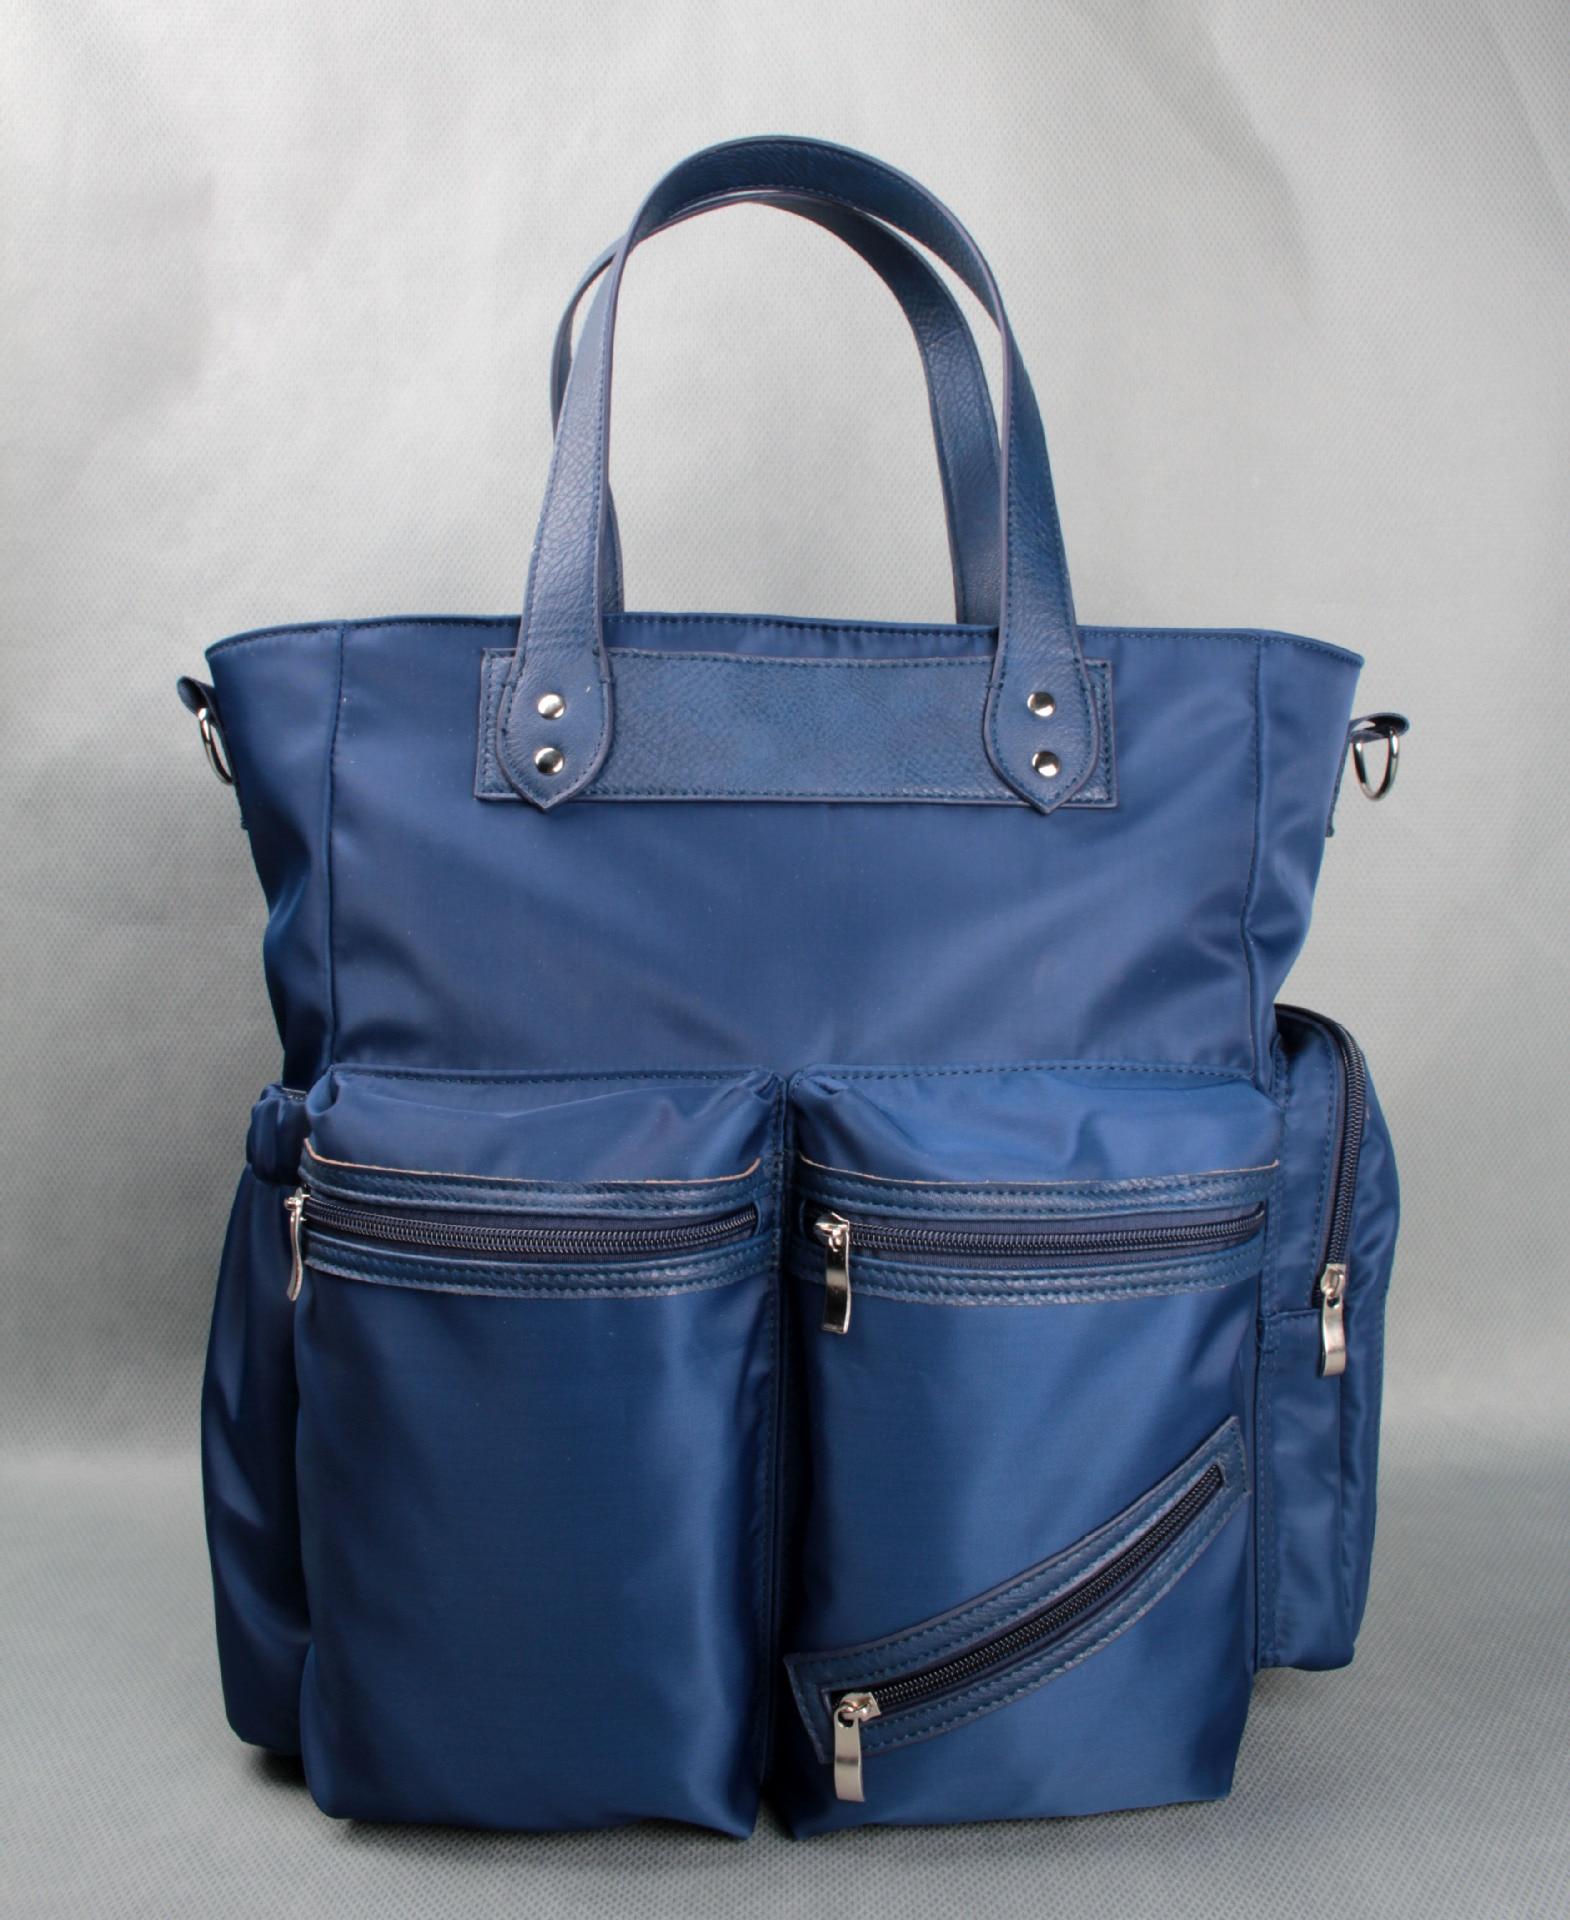 Every New Style Diaper Bag Multi-functional Dacron Diaper Bag Capacity Large Fashion Hand Diaper Bag